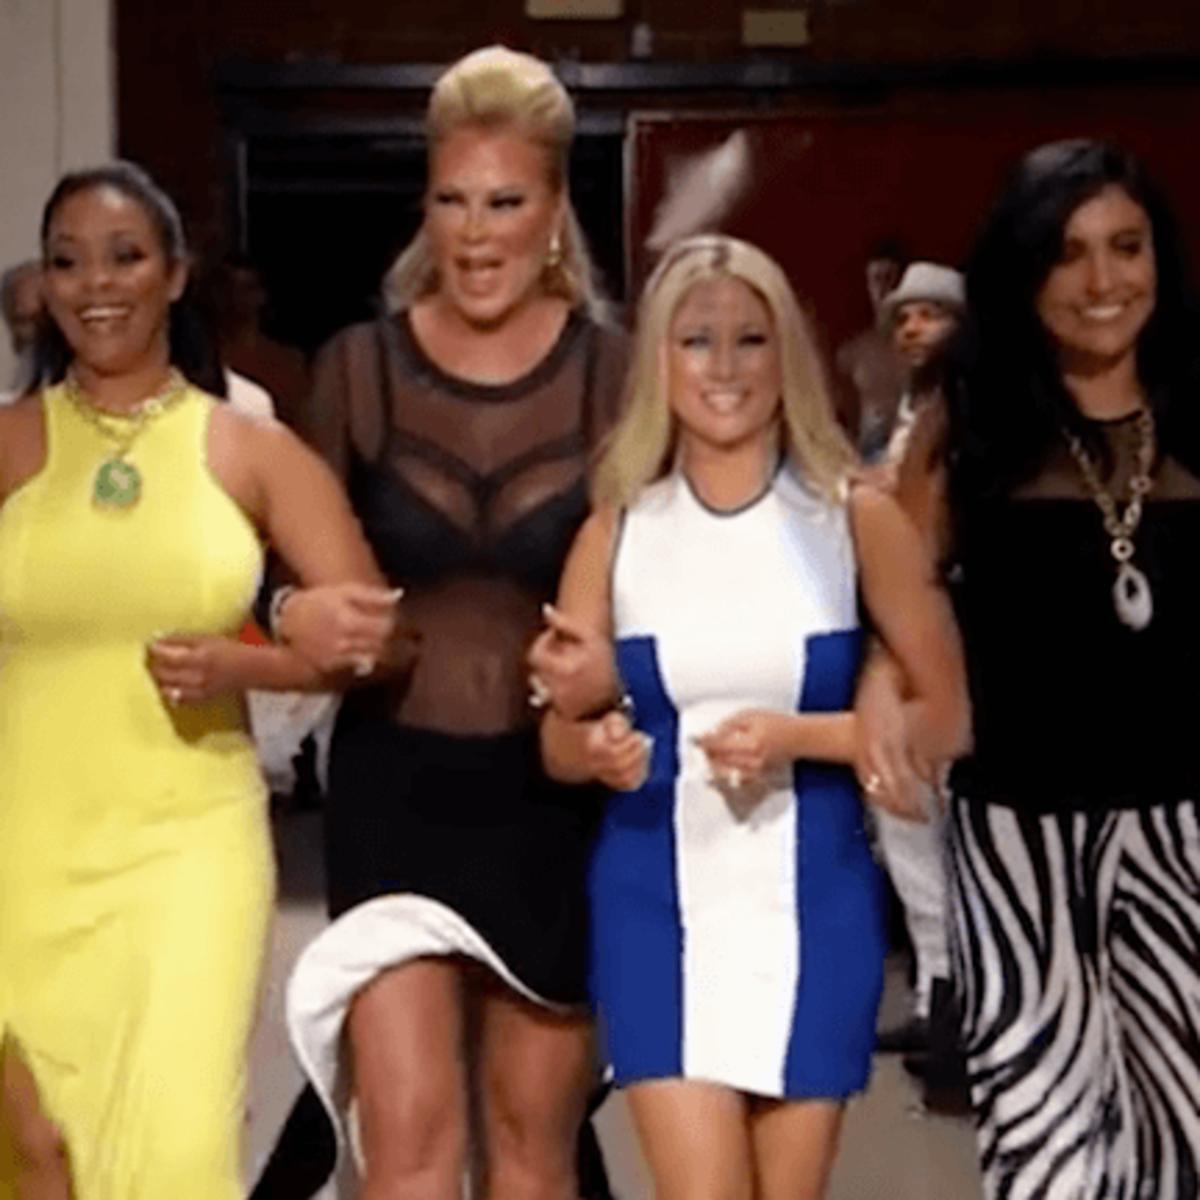 Married to Medicine Houston episode 9 fashion show, Theresa Roemer, Rachel, Ashandra